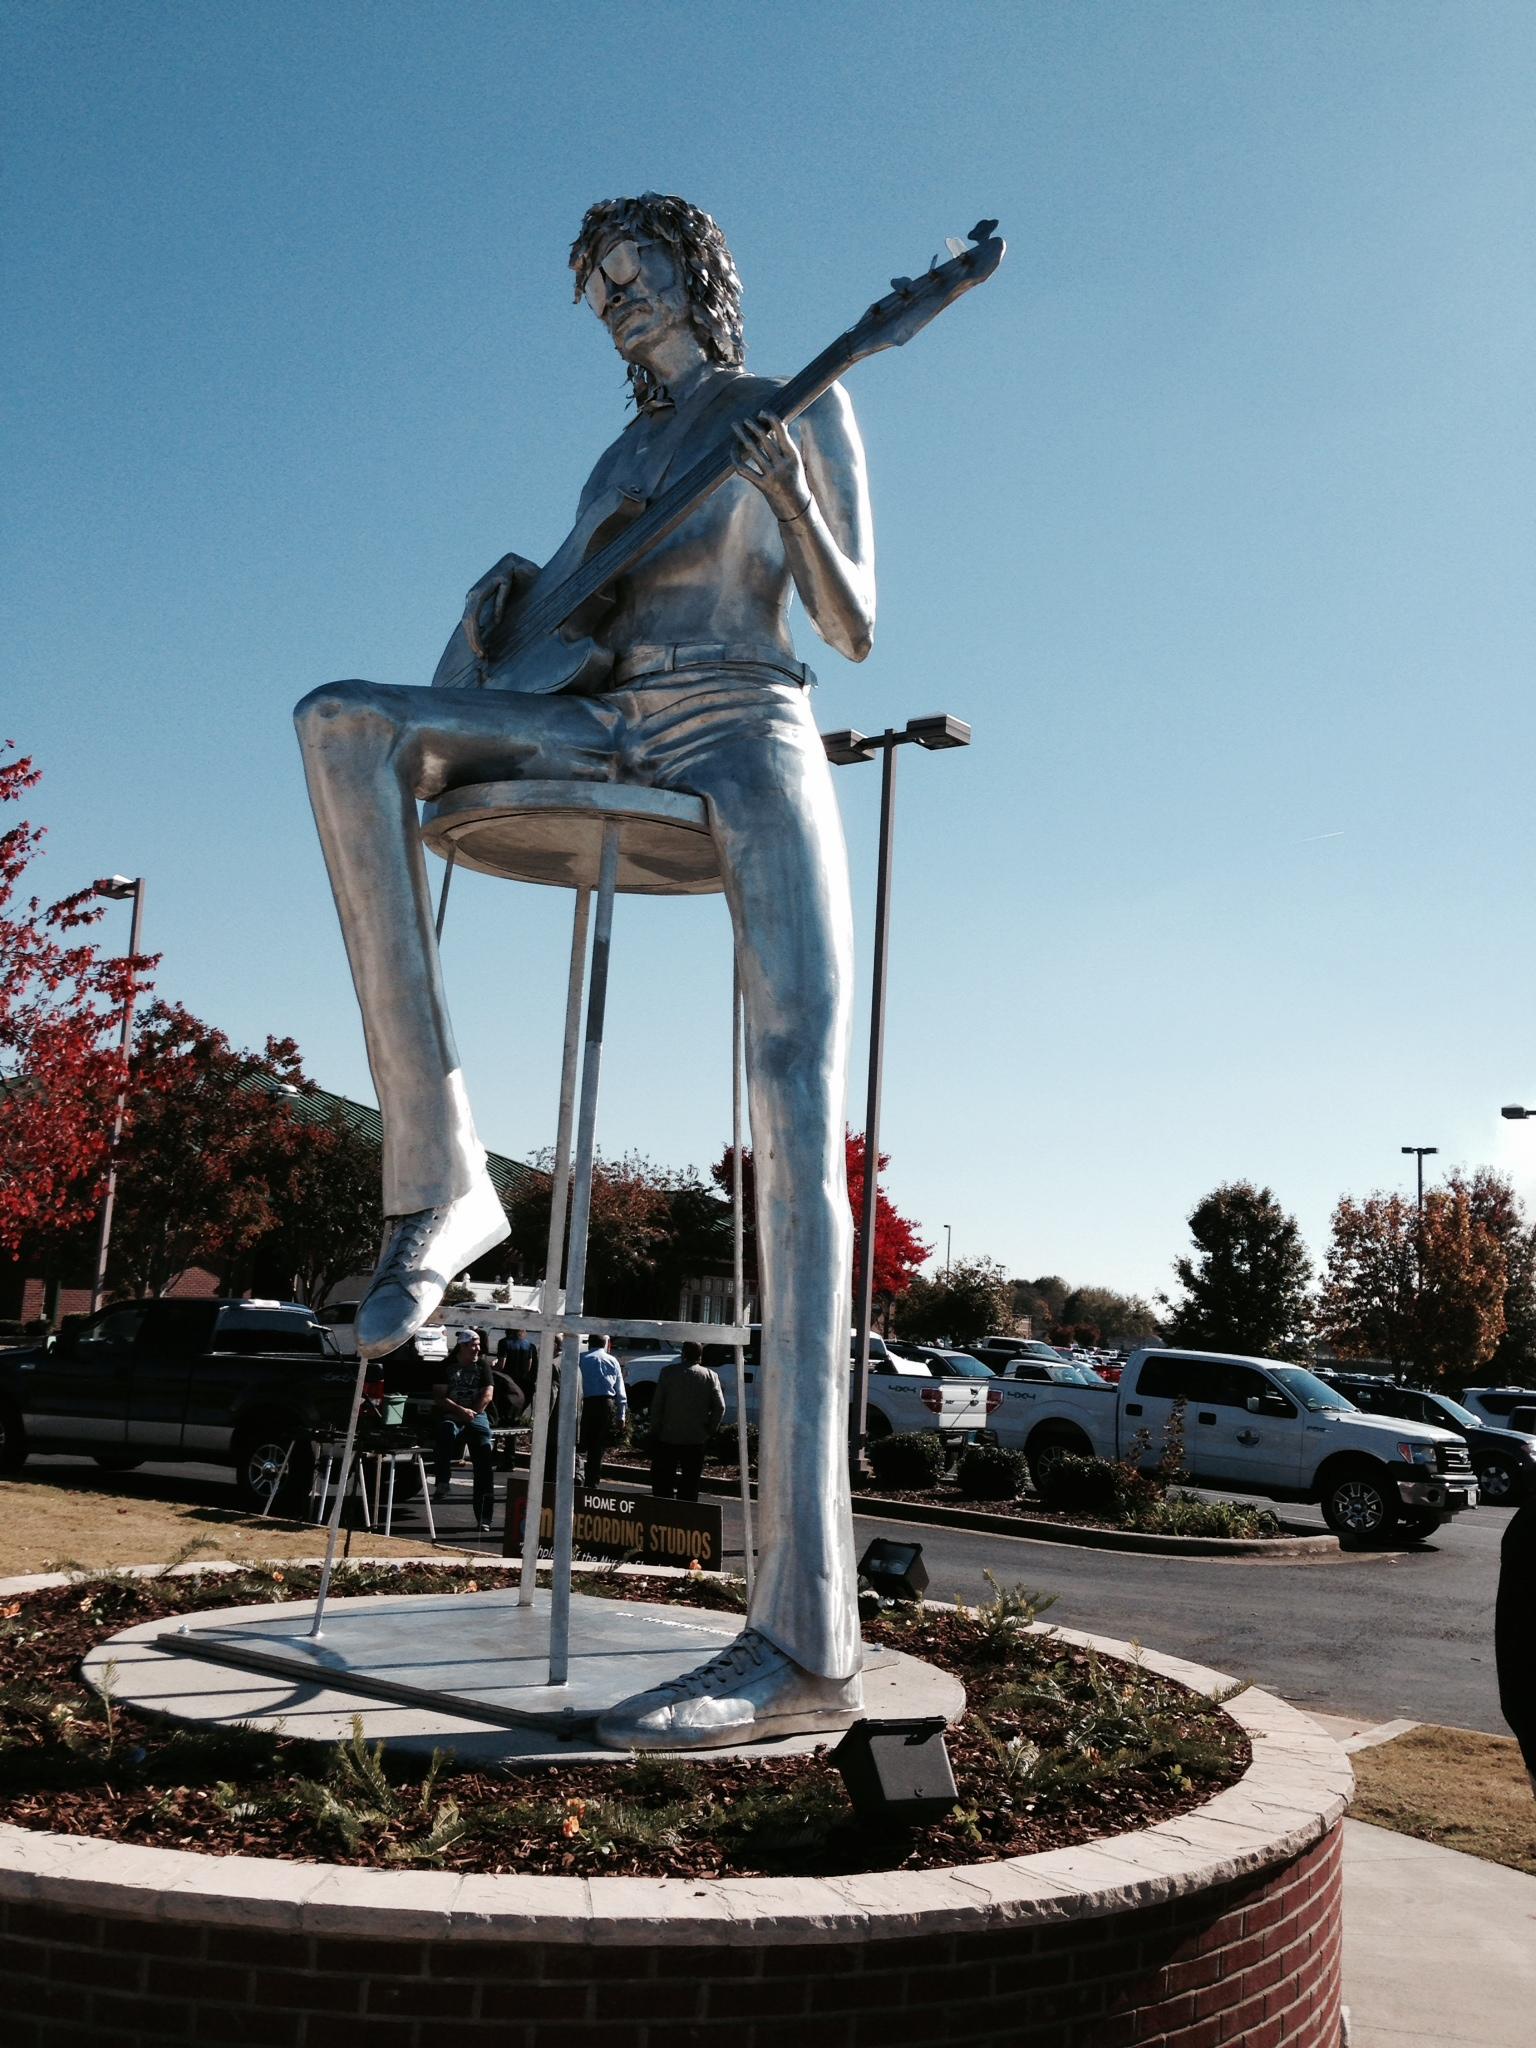 David Hood Statue